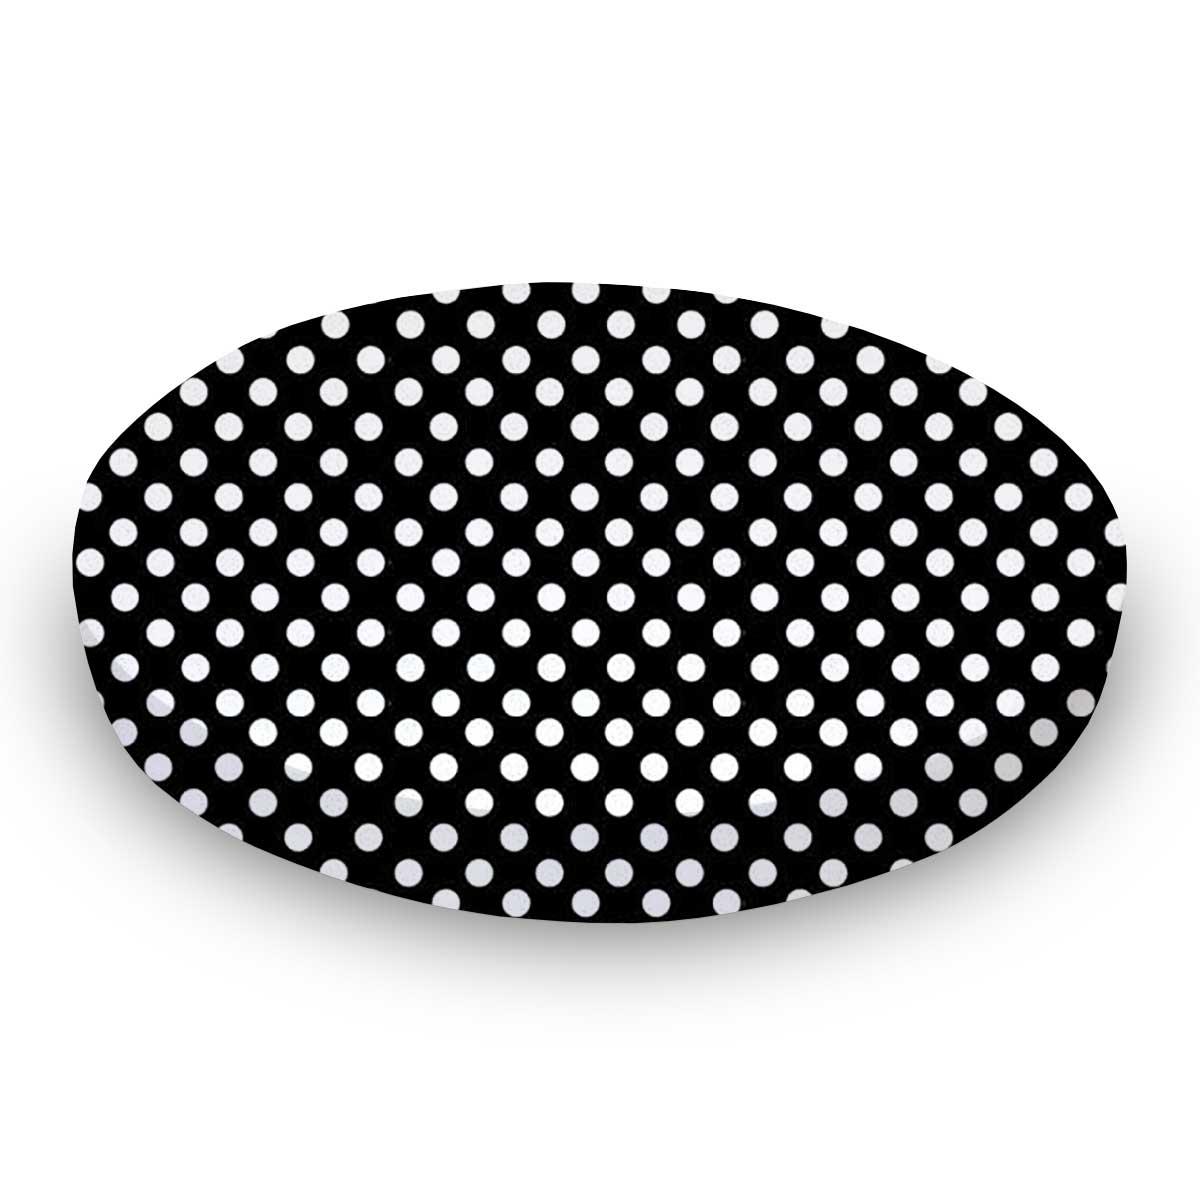 Primary Polka Dots Black Woven